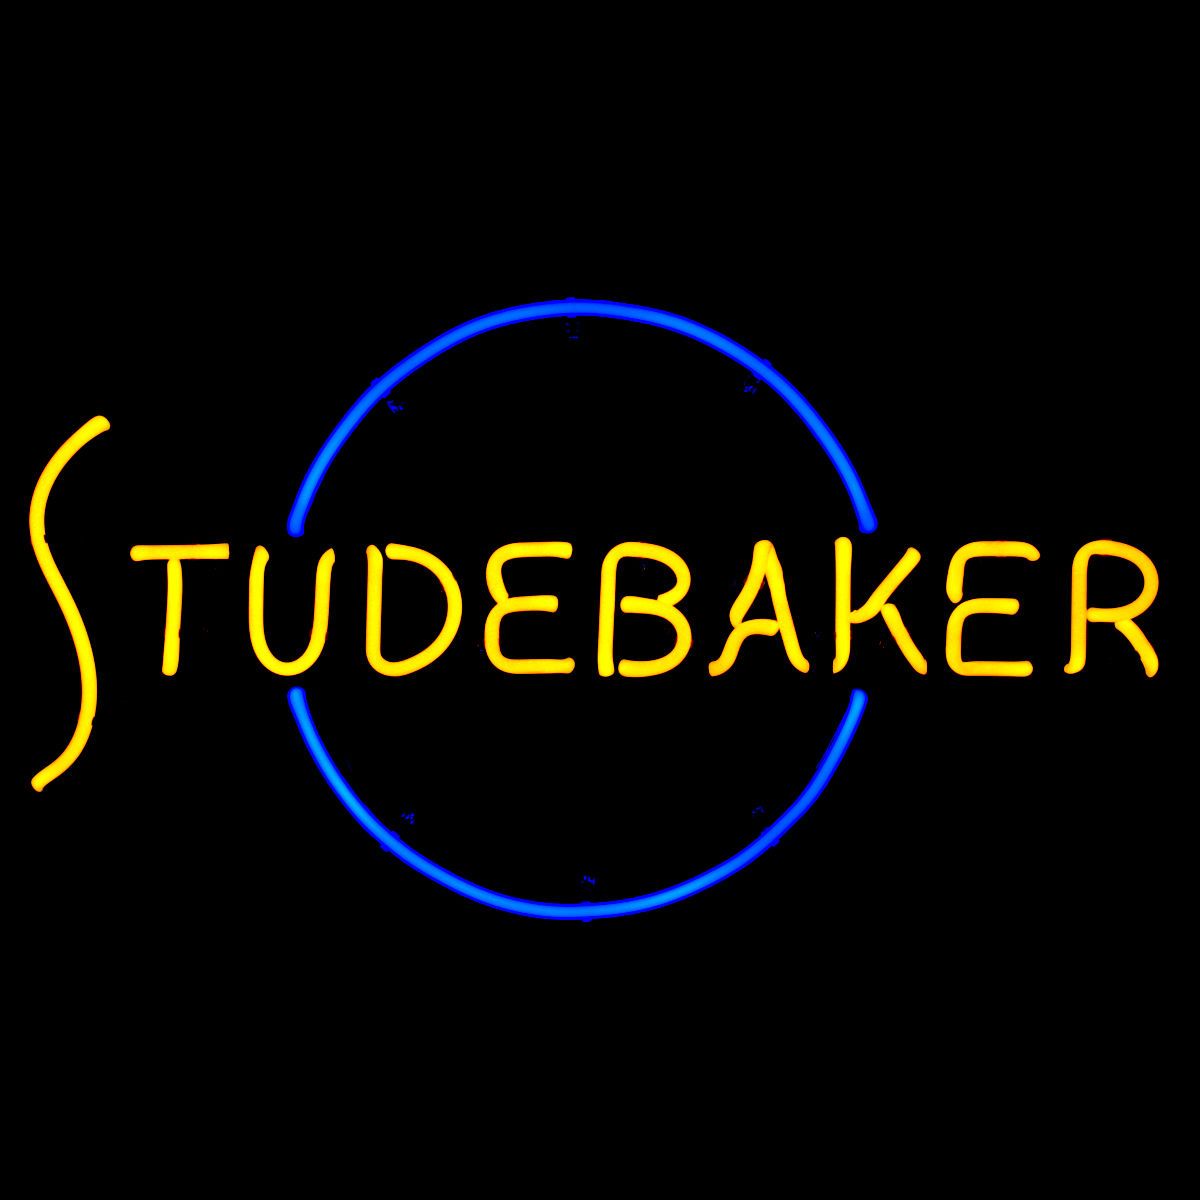 Studebaker Neon Signs by John Barton - Former Studebaker Packard New Car Dealer - BartonNeonMagic.com